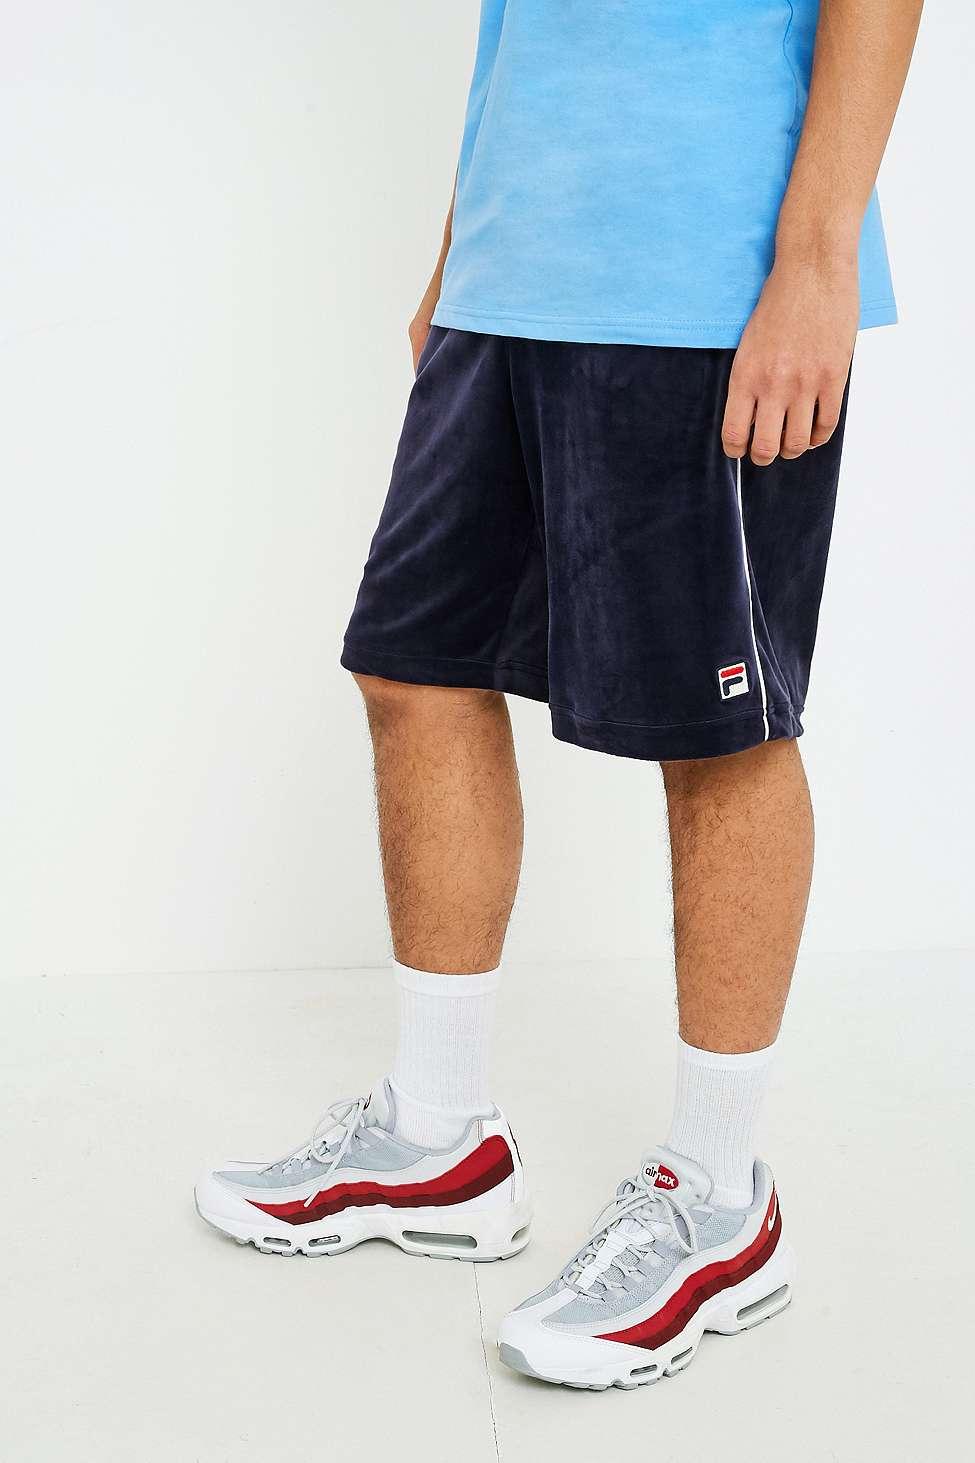 Cristaudo shorts Fila